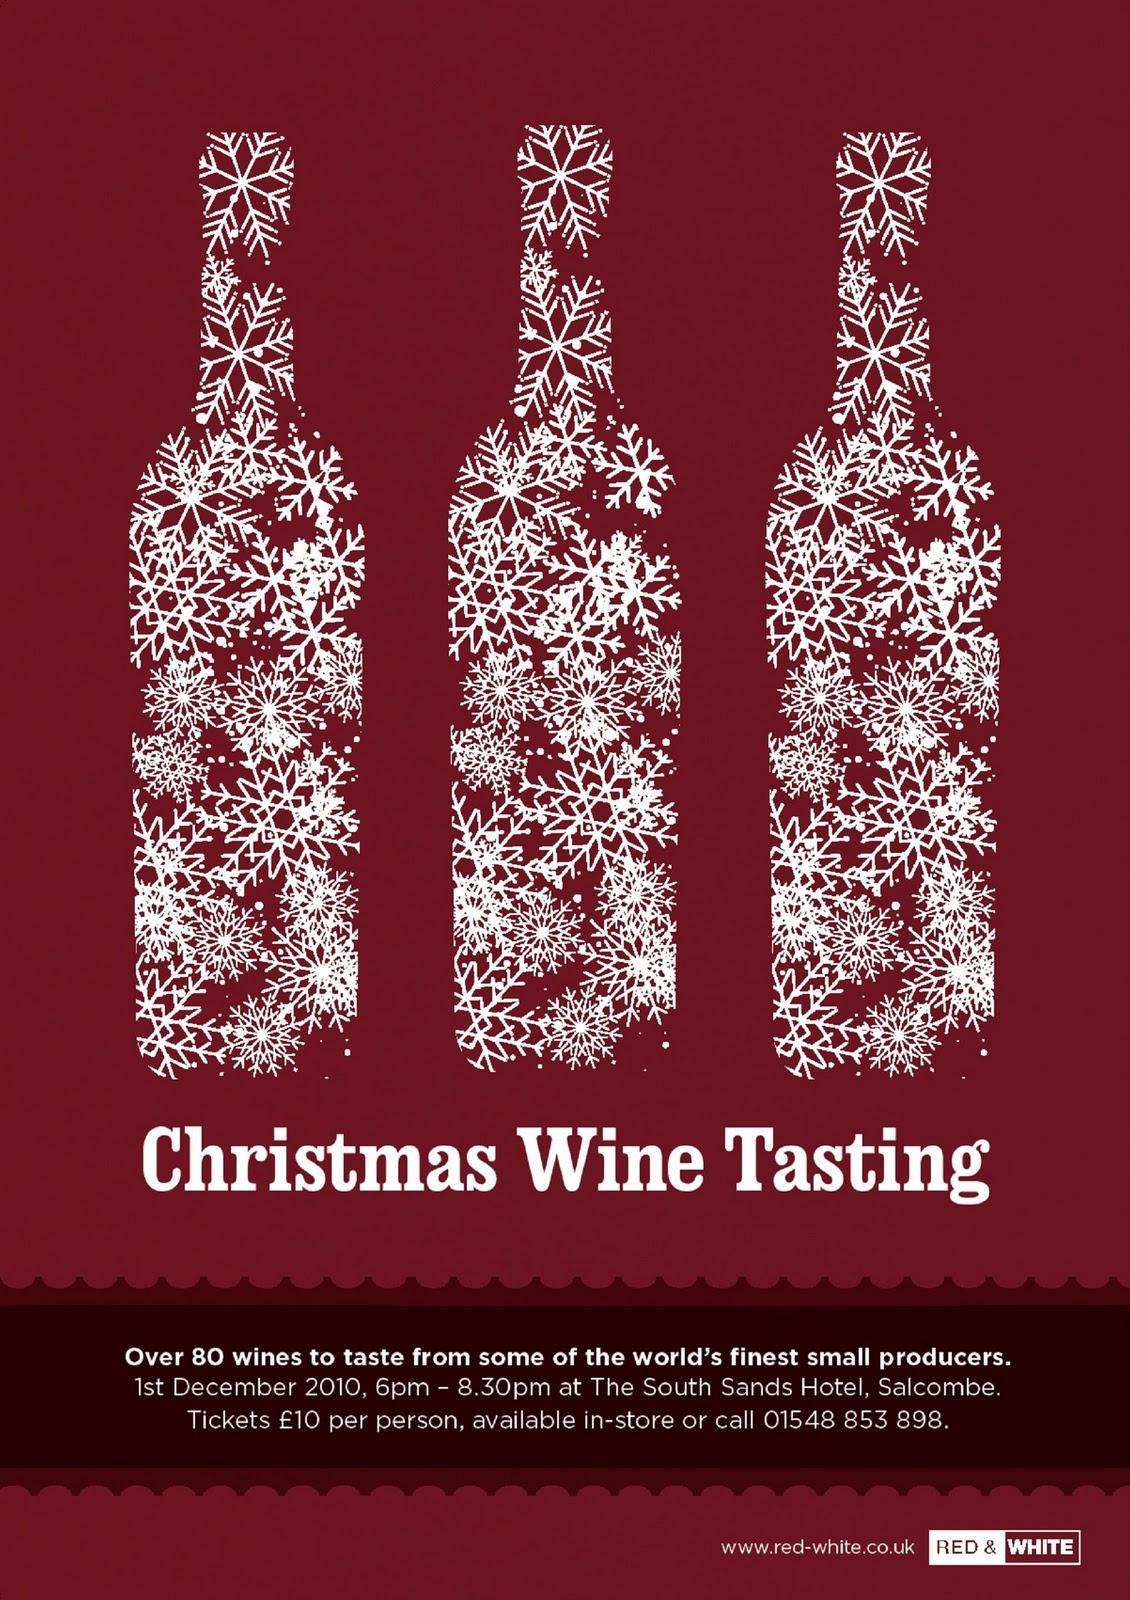 Red White Christmas Wine Tasting